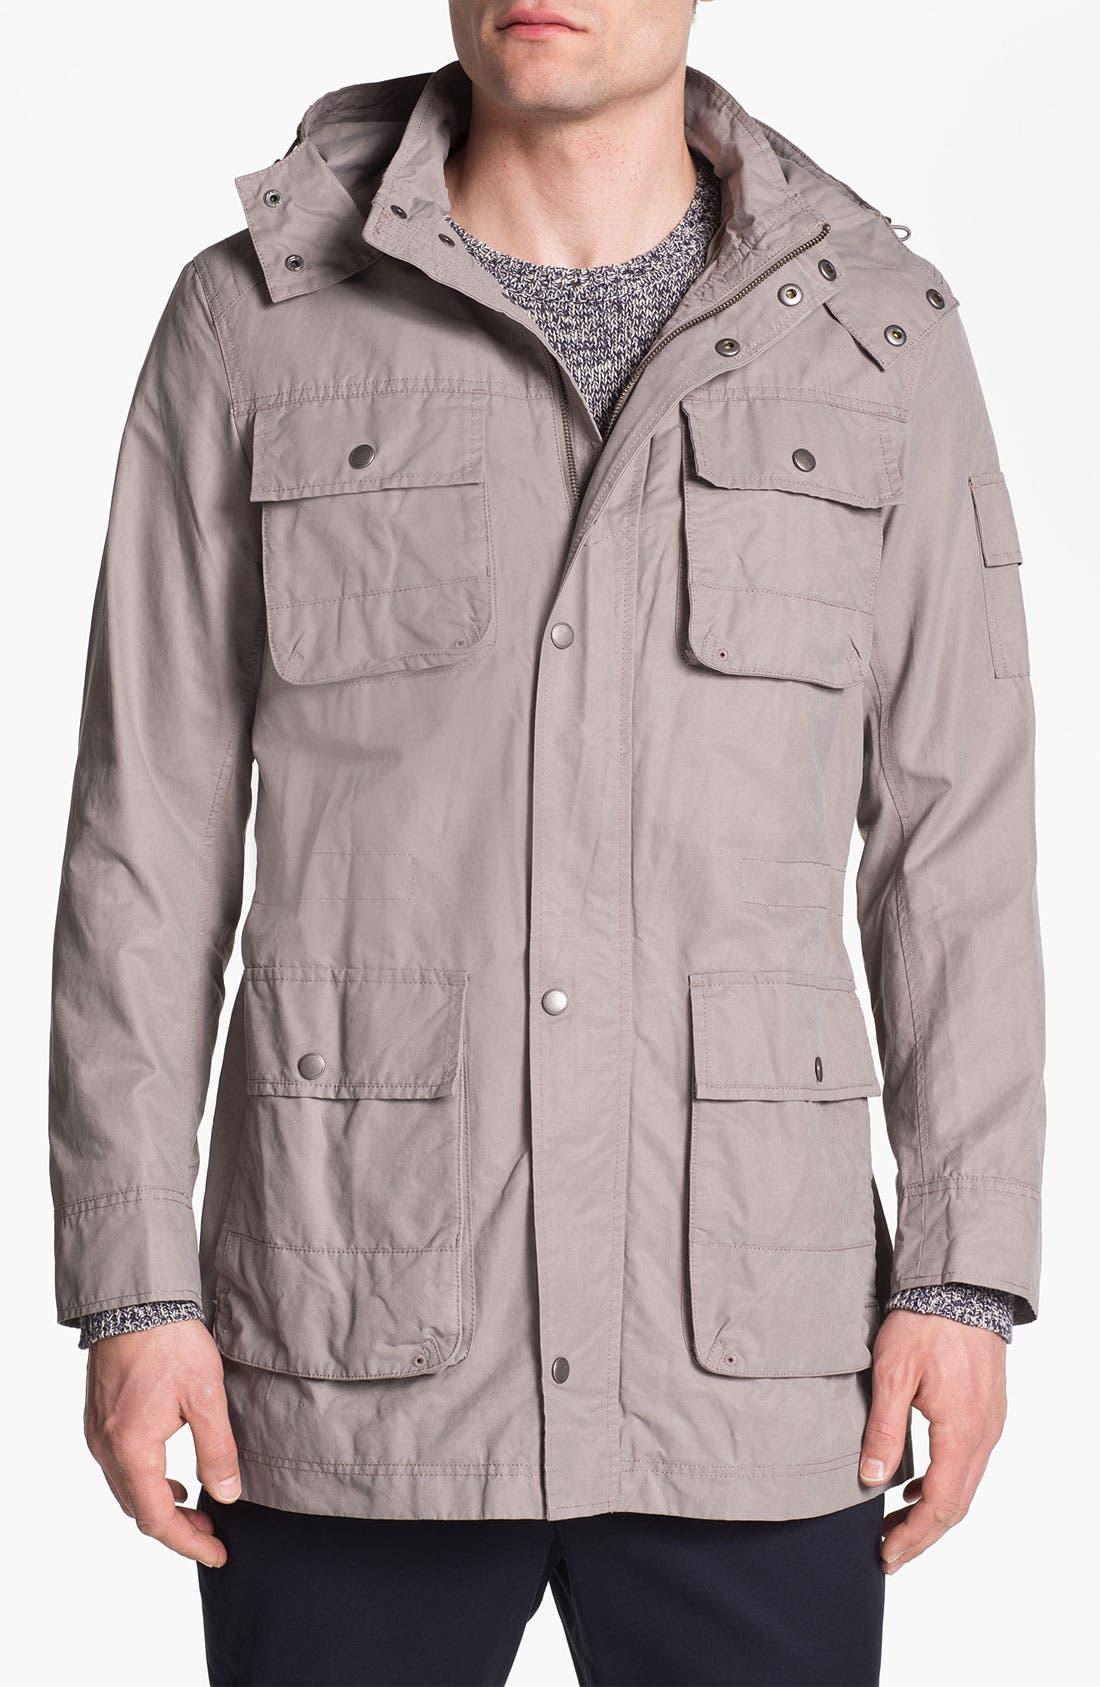 Alternate Image 1 Selected - Cole Haan Hooded Jacket